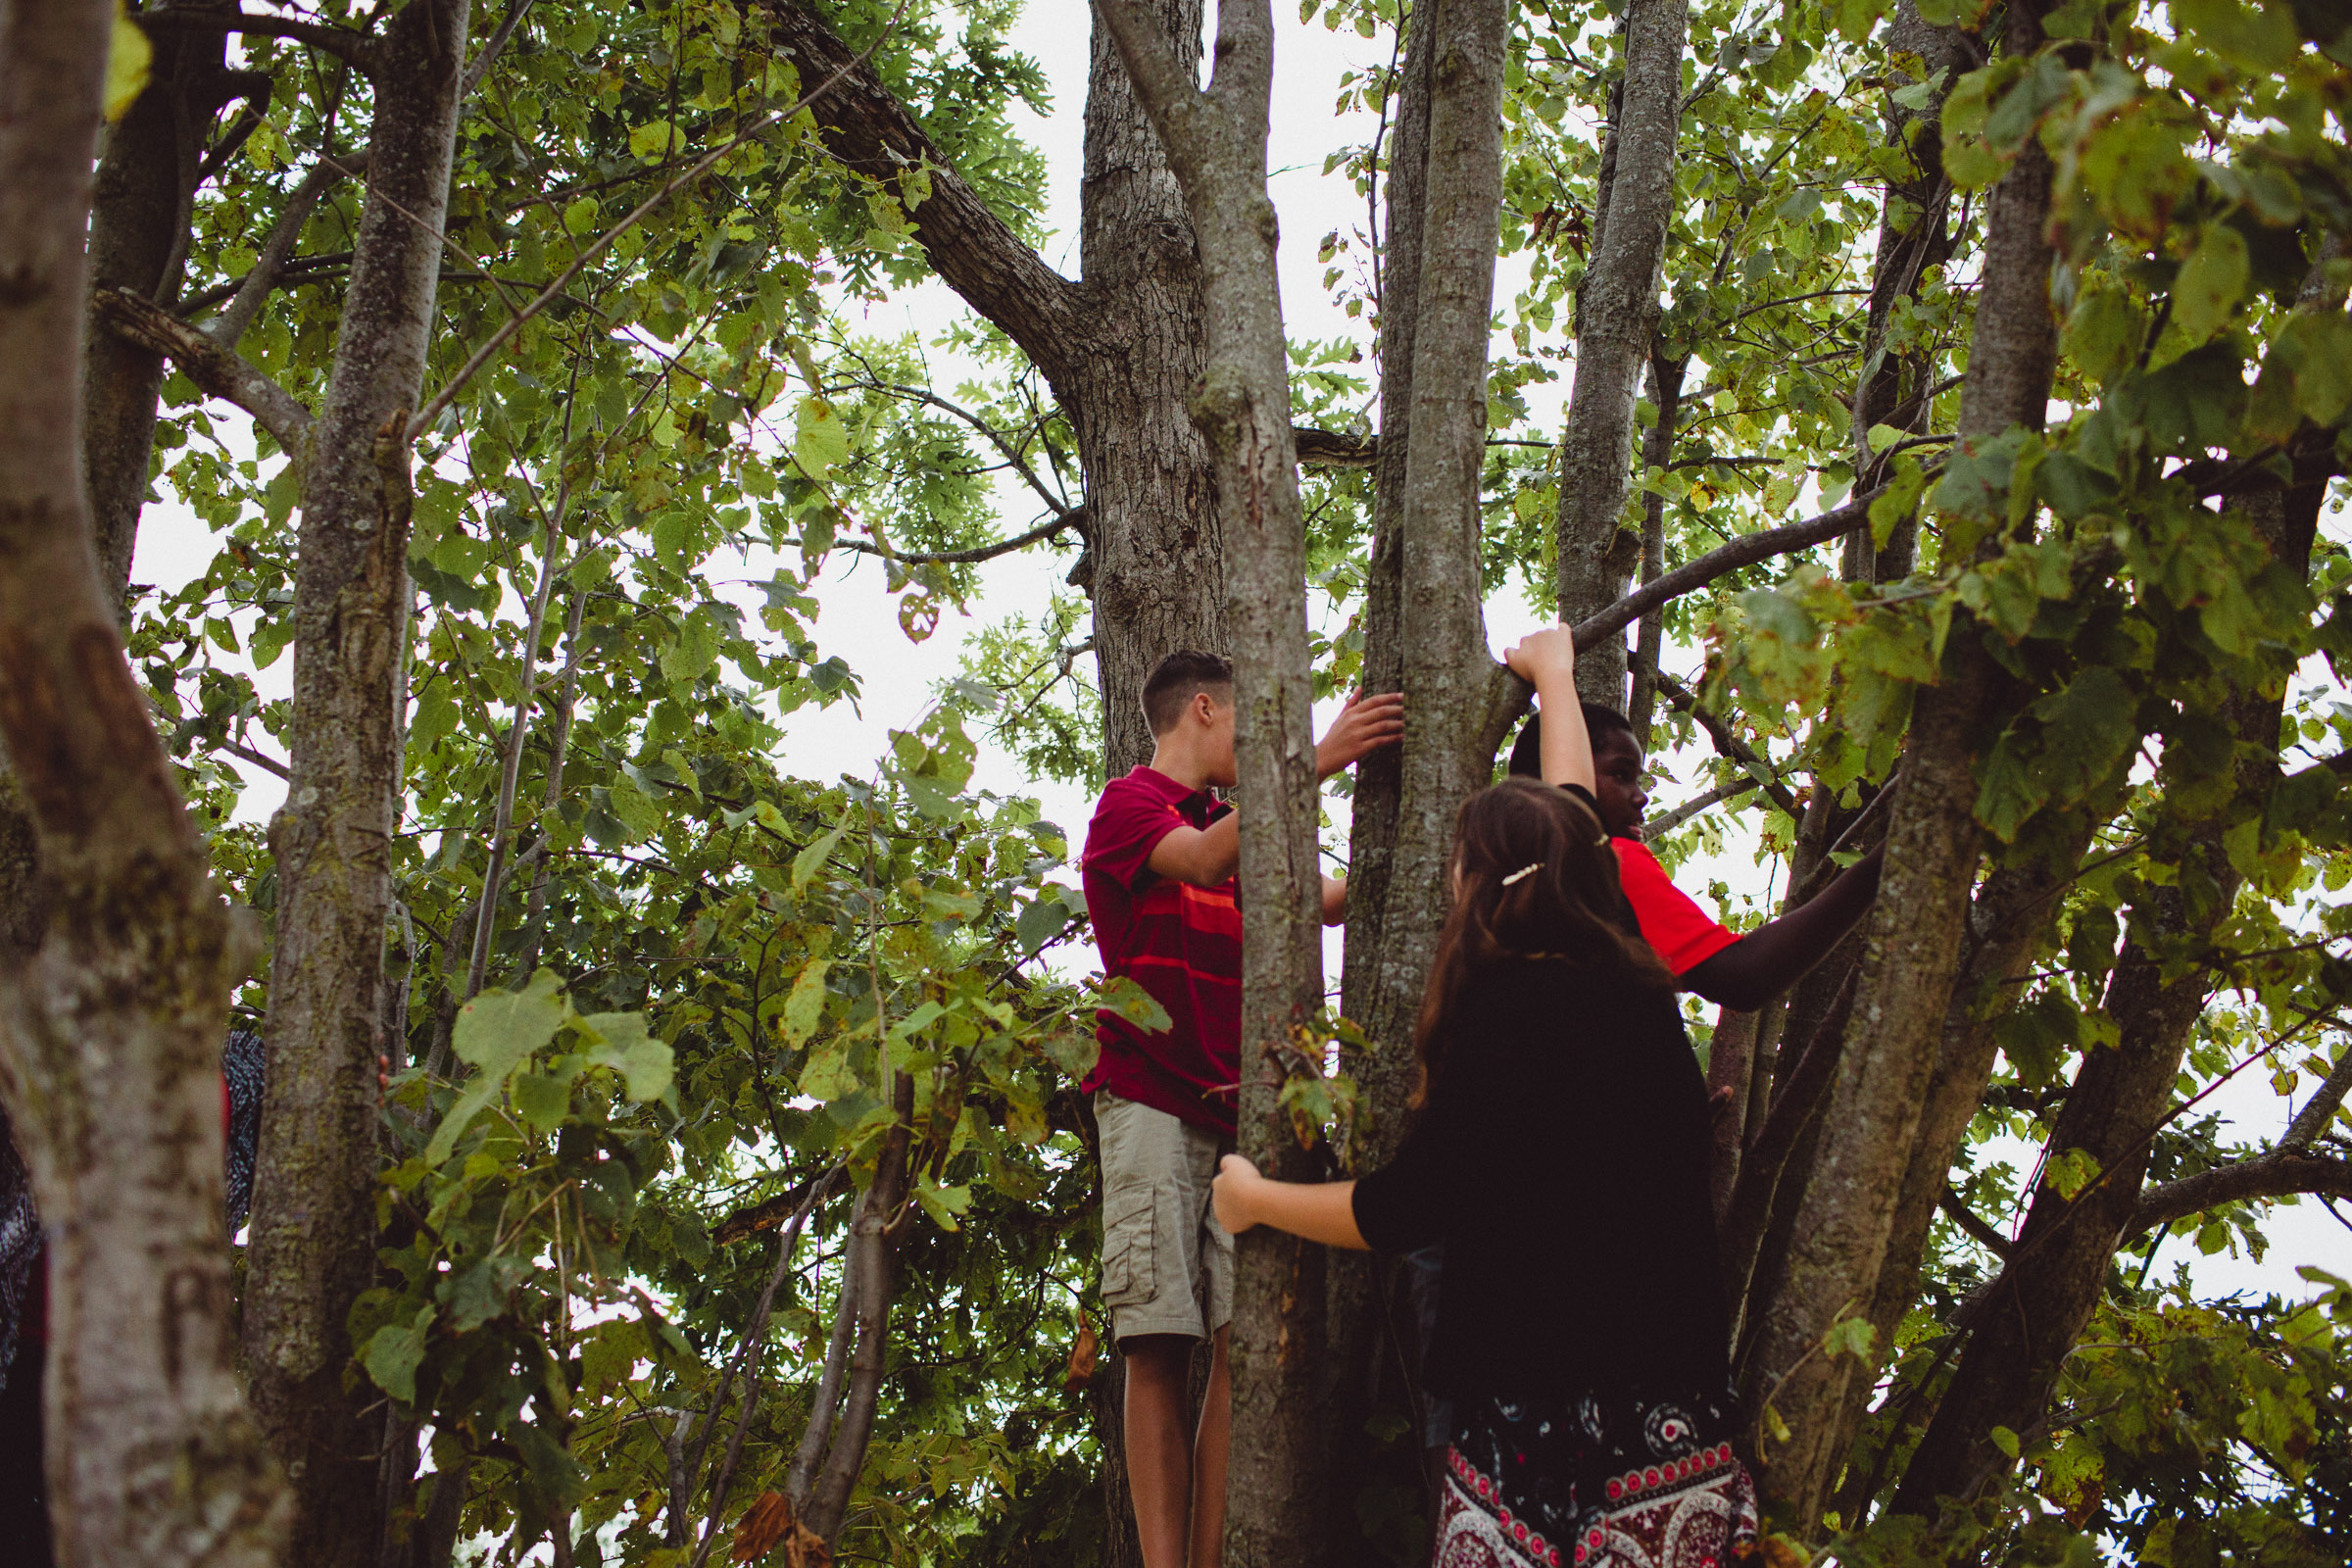 siblings exploring and climbing trees